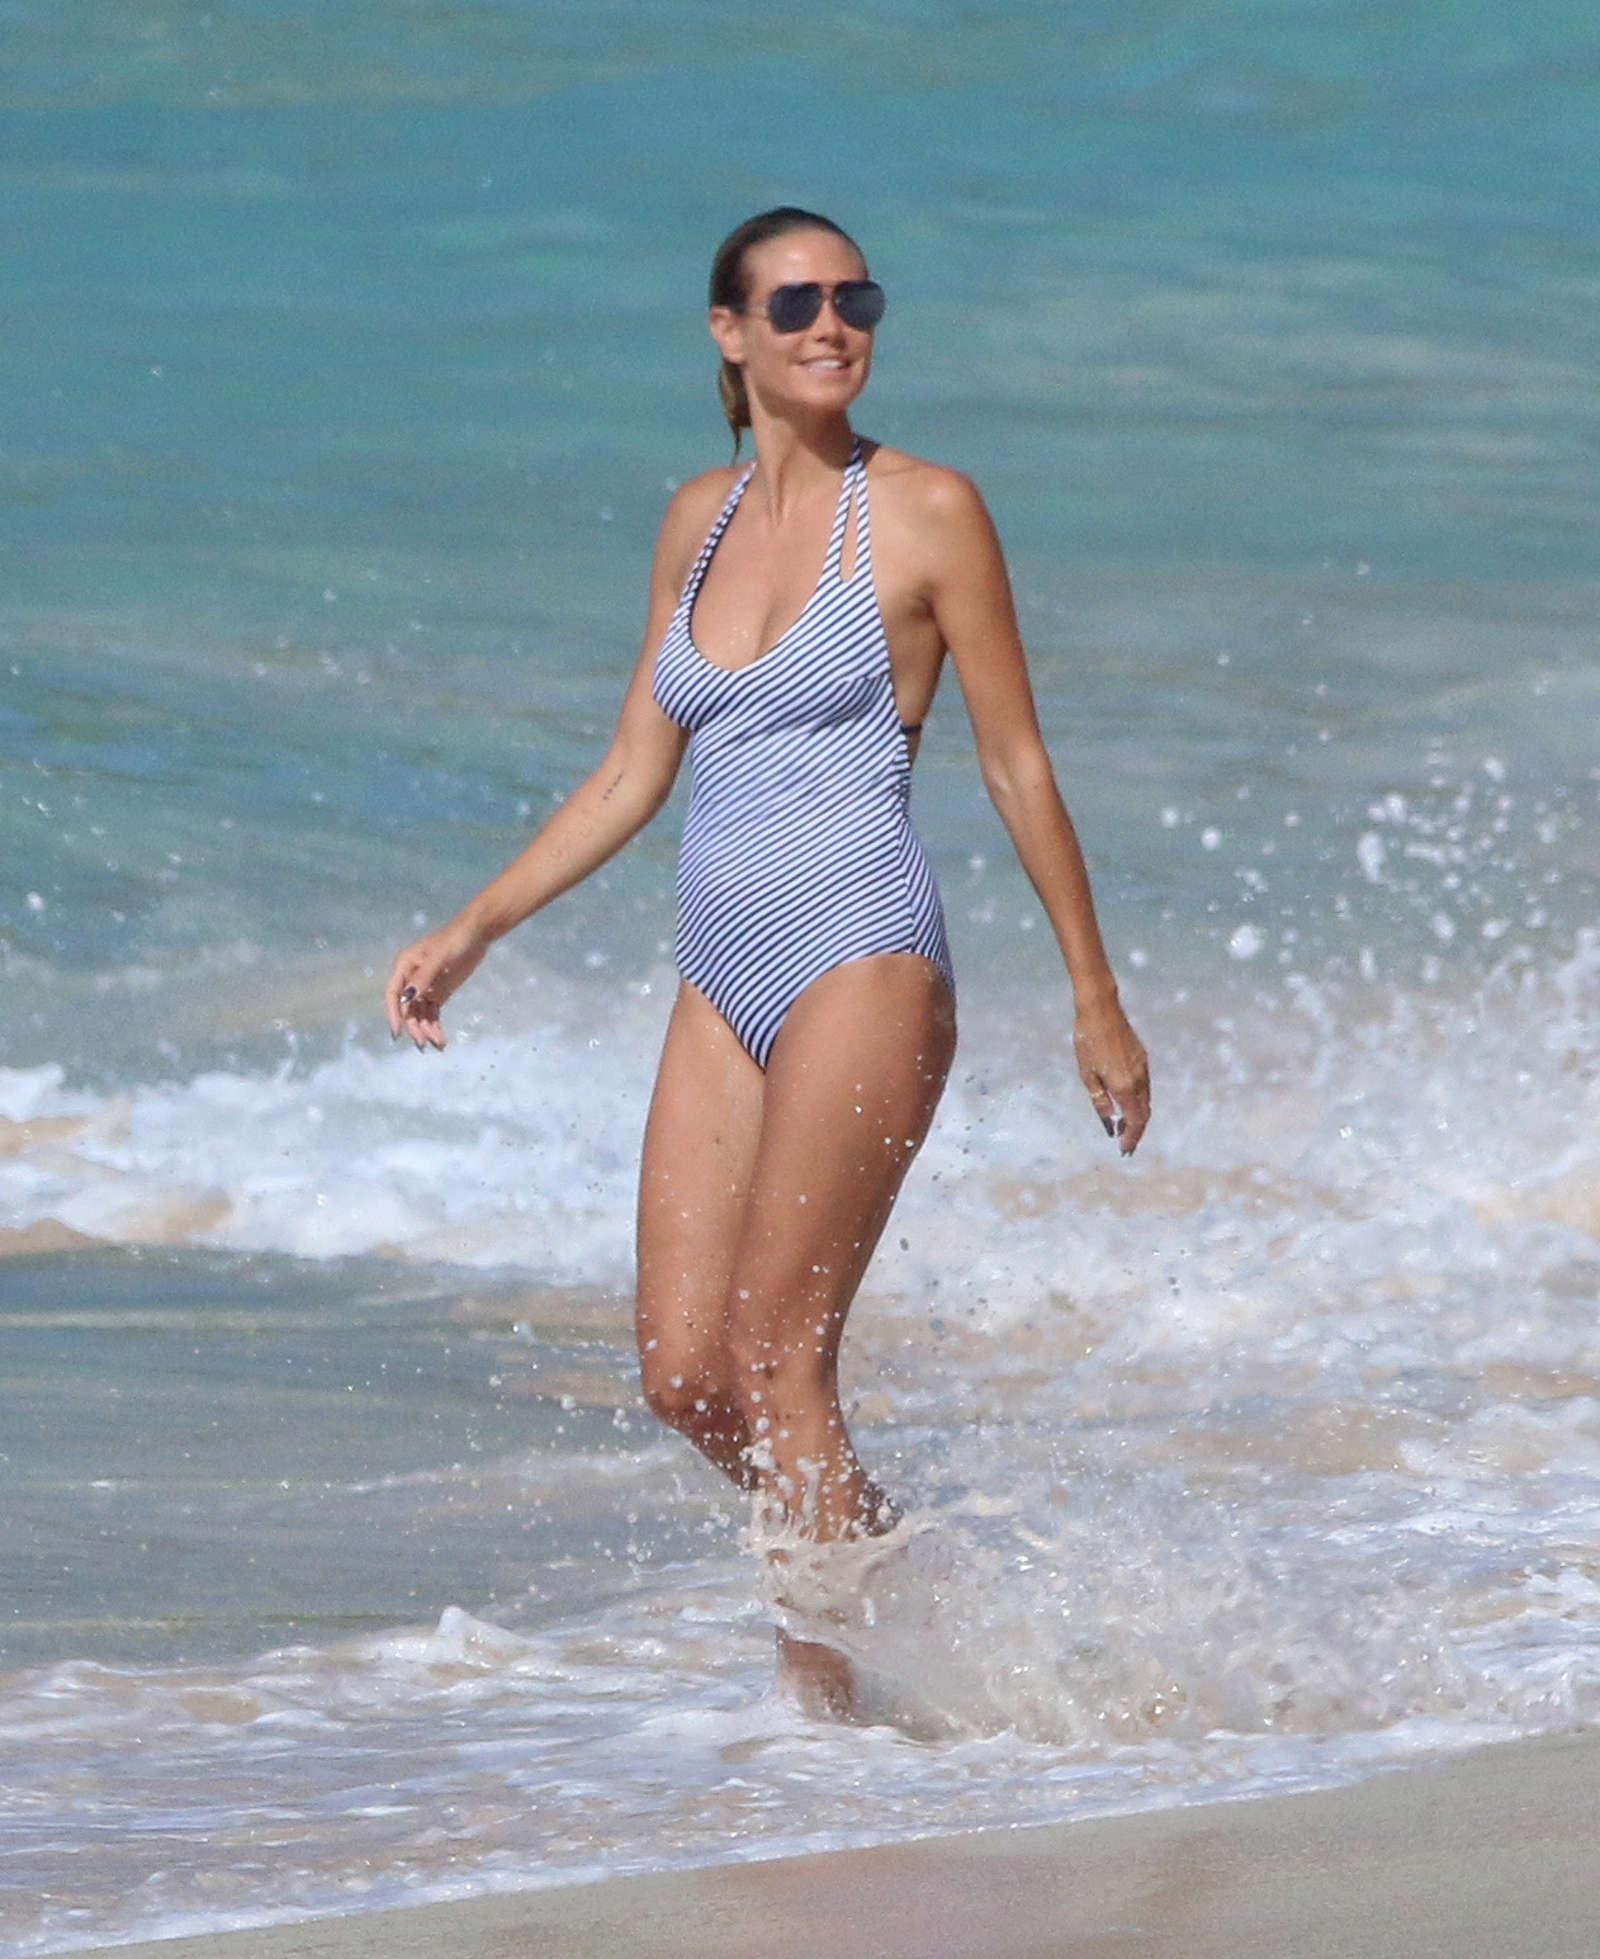 Heidi Klum in Swimsuit on the beach in Caribbean